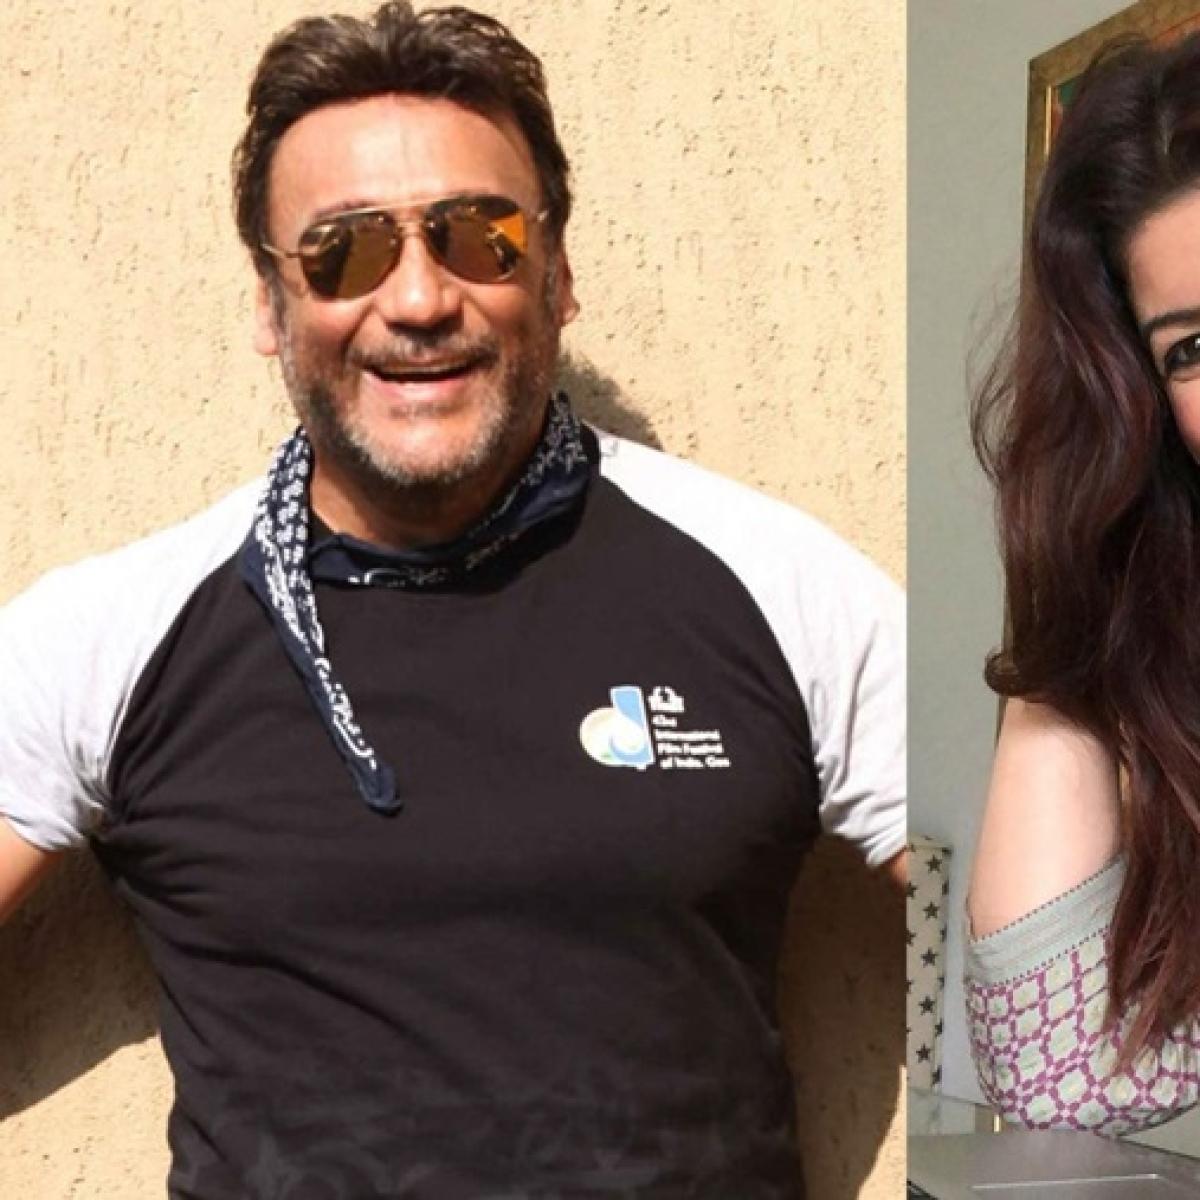 Bhidu, use this protection ke liye: When Jackie Shroff gave Twinkle Khanna some 'weed'